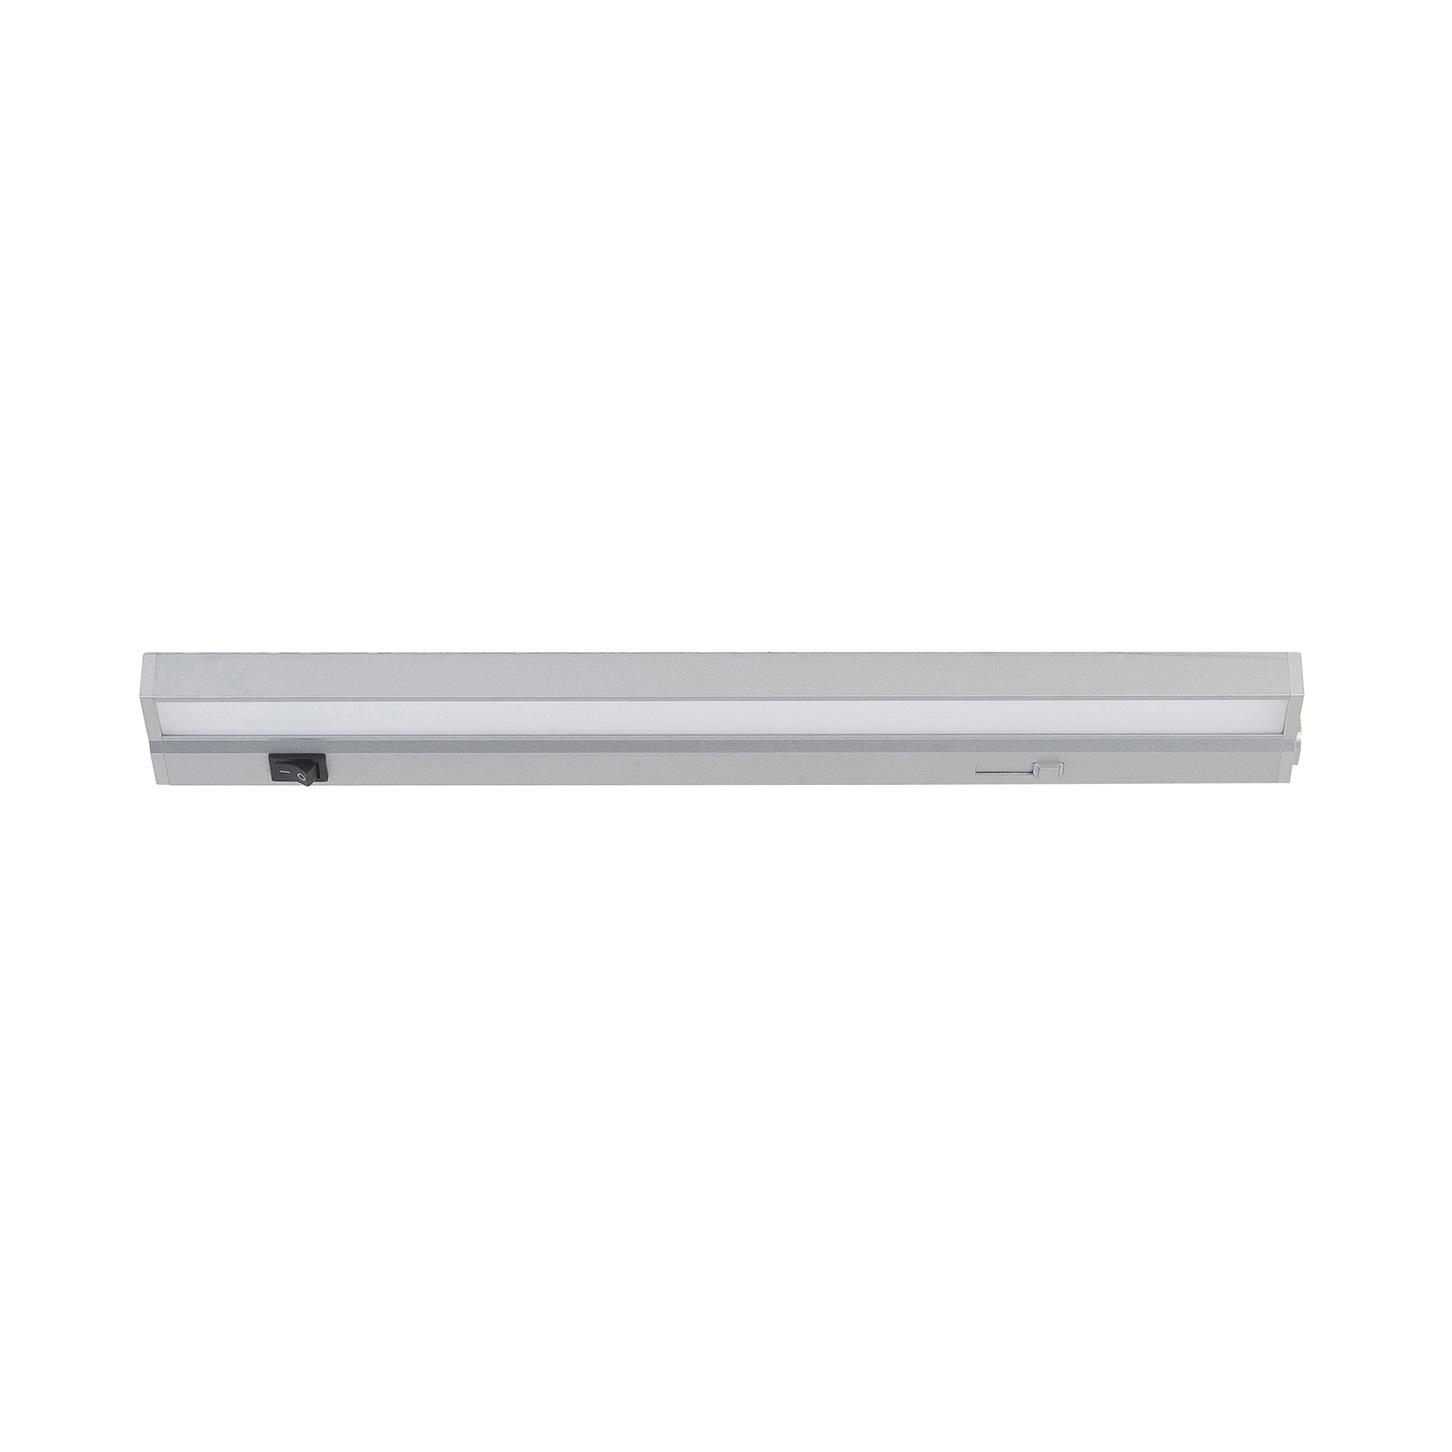 Highlight Kast verlichting LED 42,5 cm aluminium